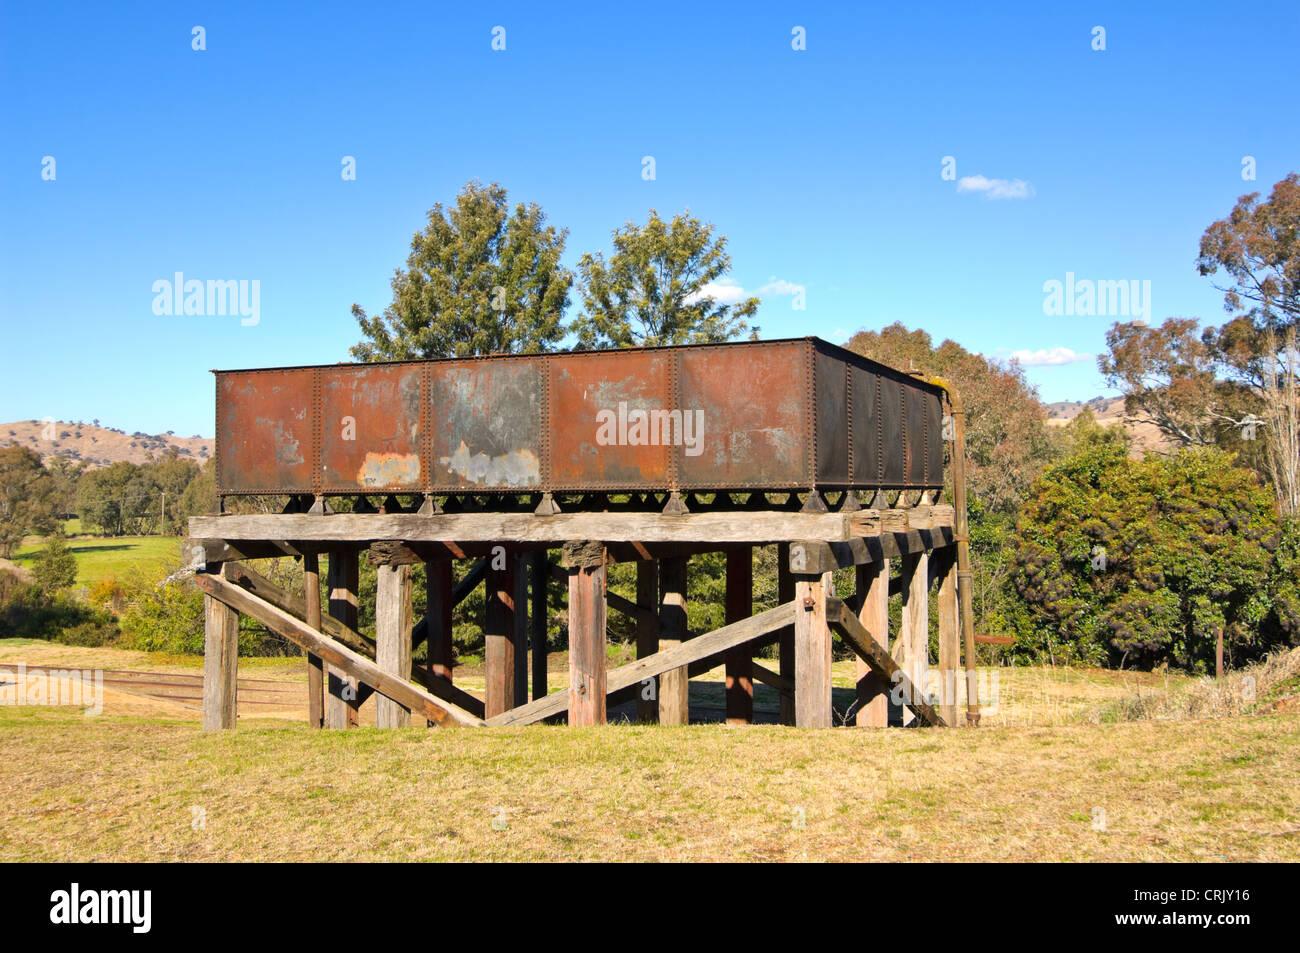 Old Railway Water Tank, Gundagai, New South Wales, Australia - Stock Image